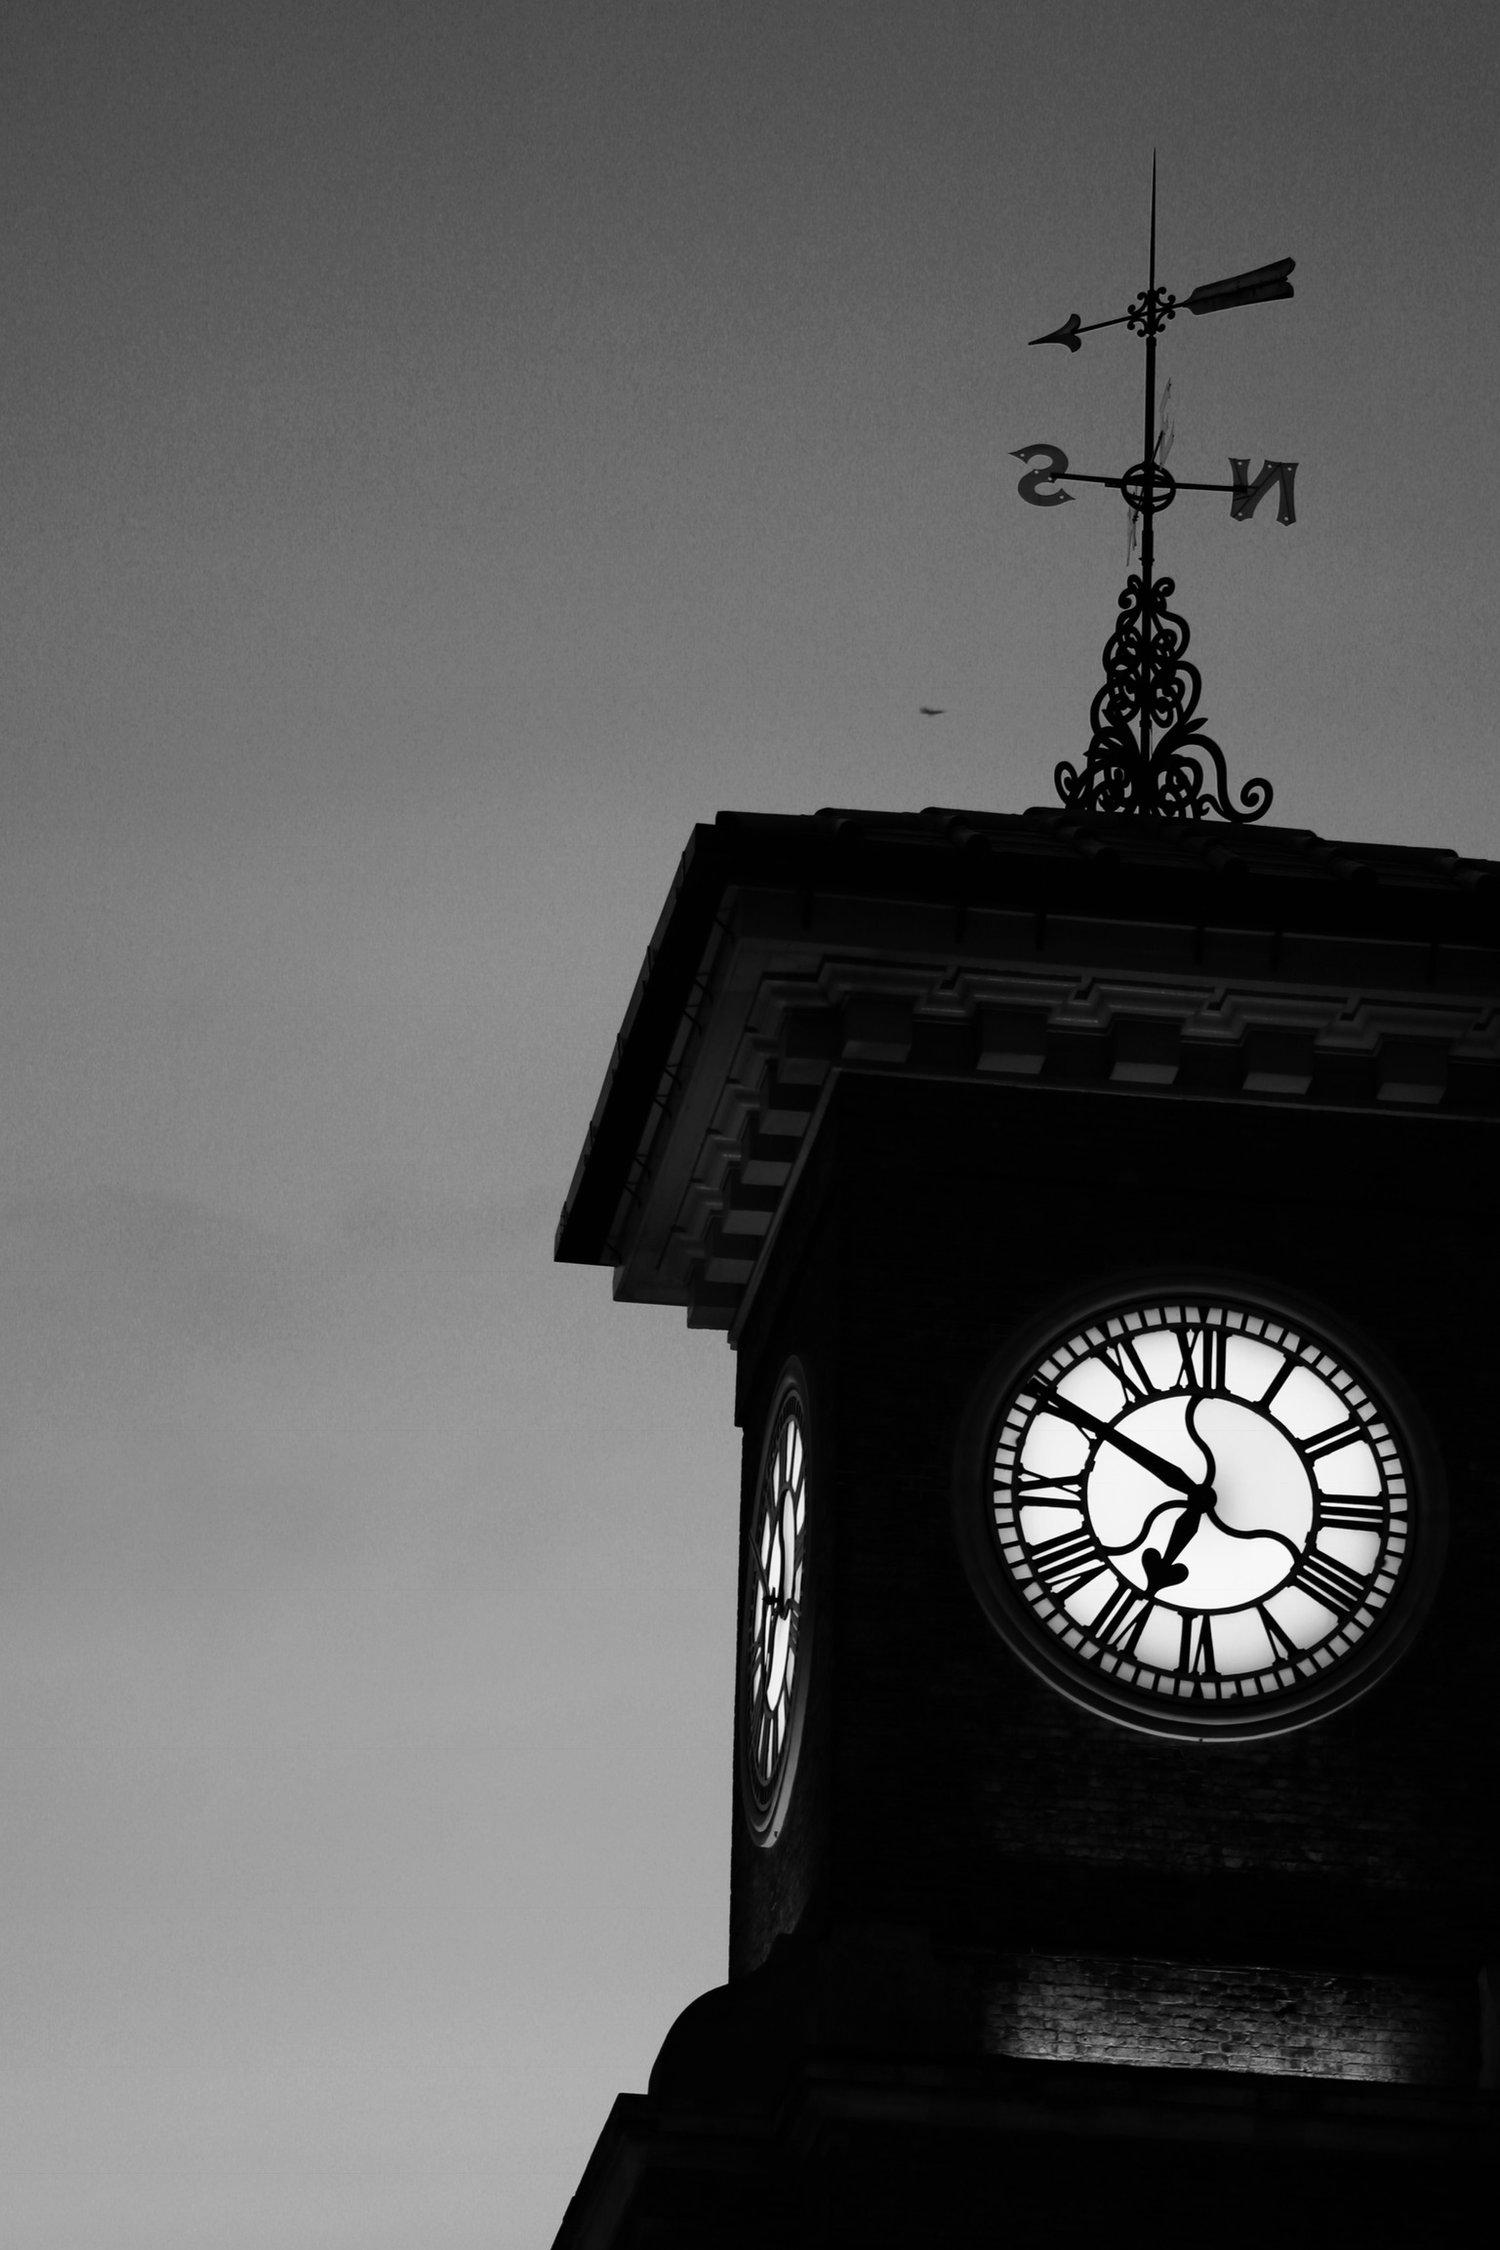 King's Cross St Pancras